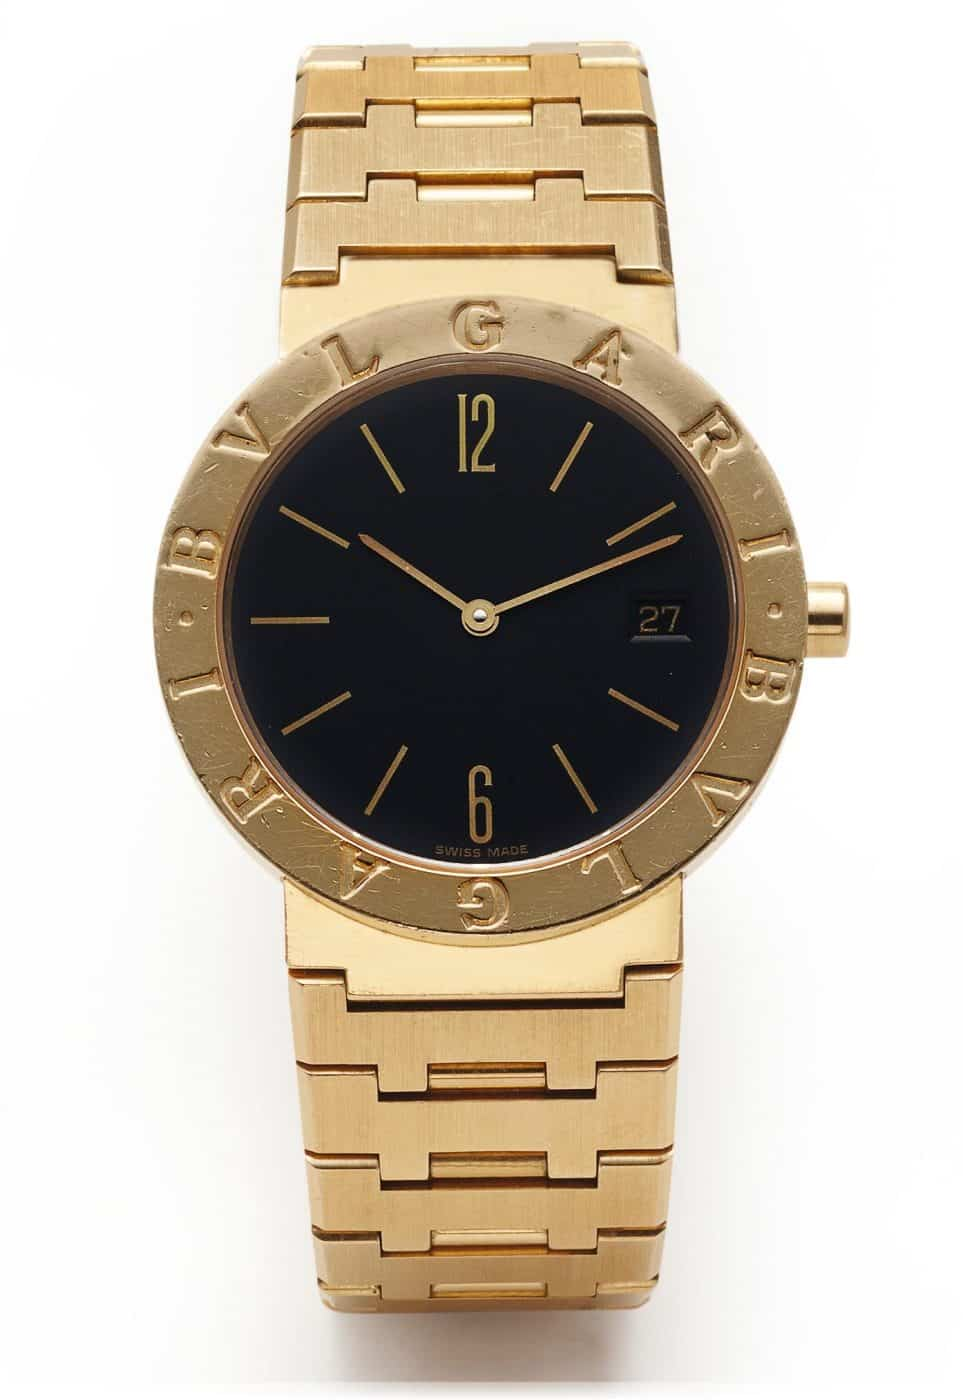 The Bulgari Bulgari watch, designed by Gérald Genta